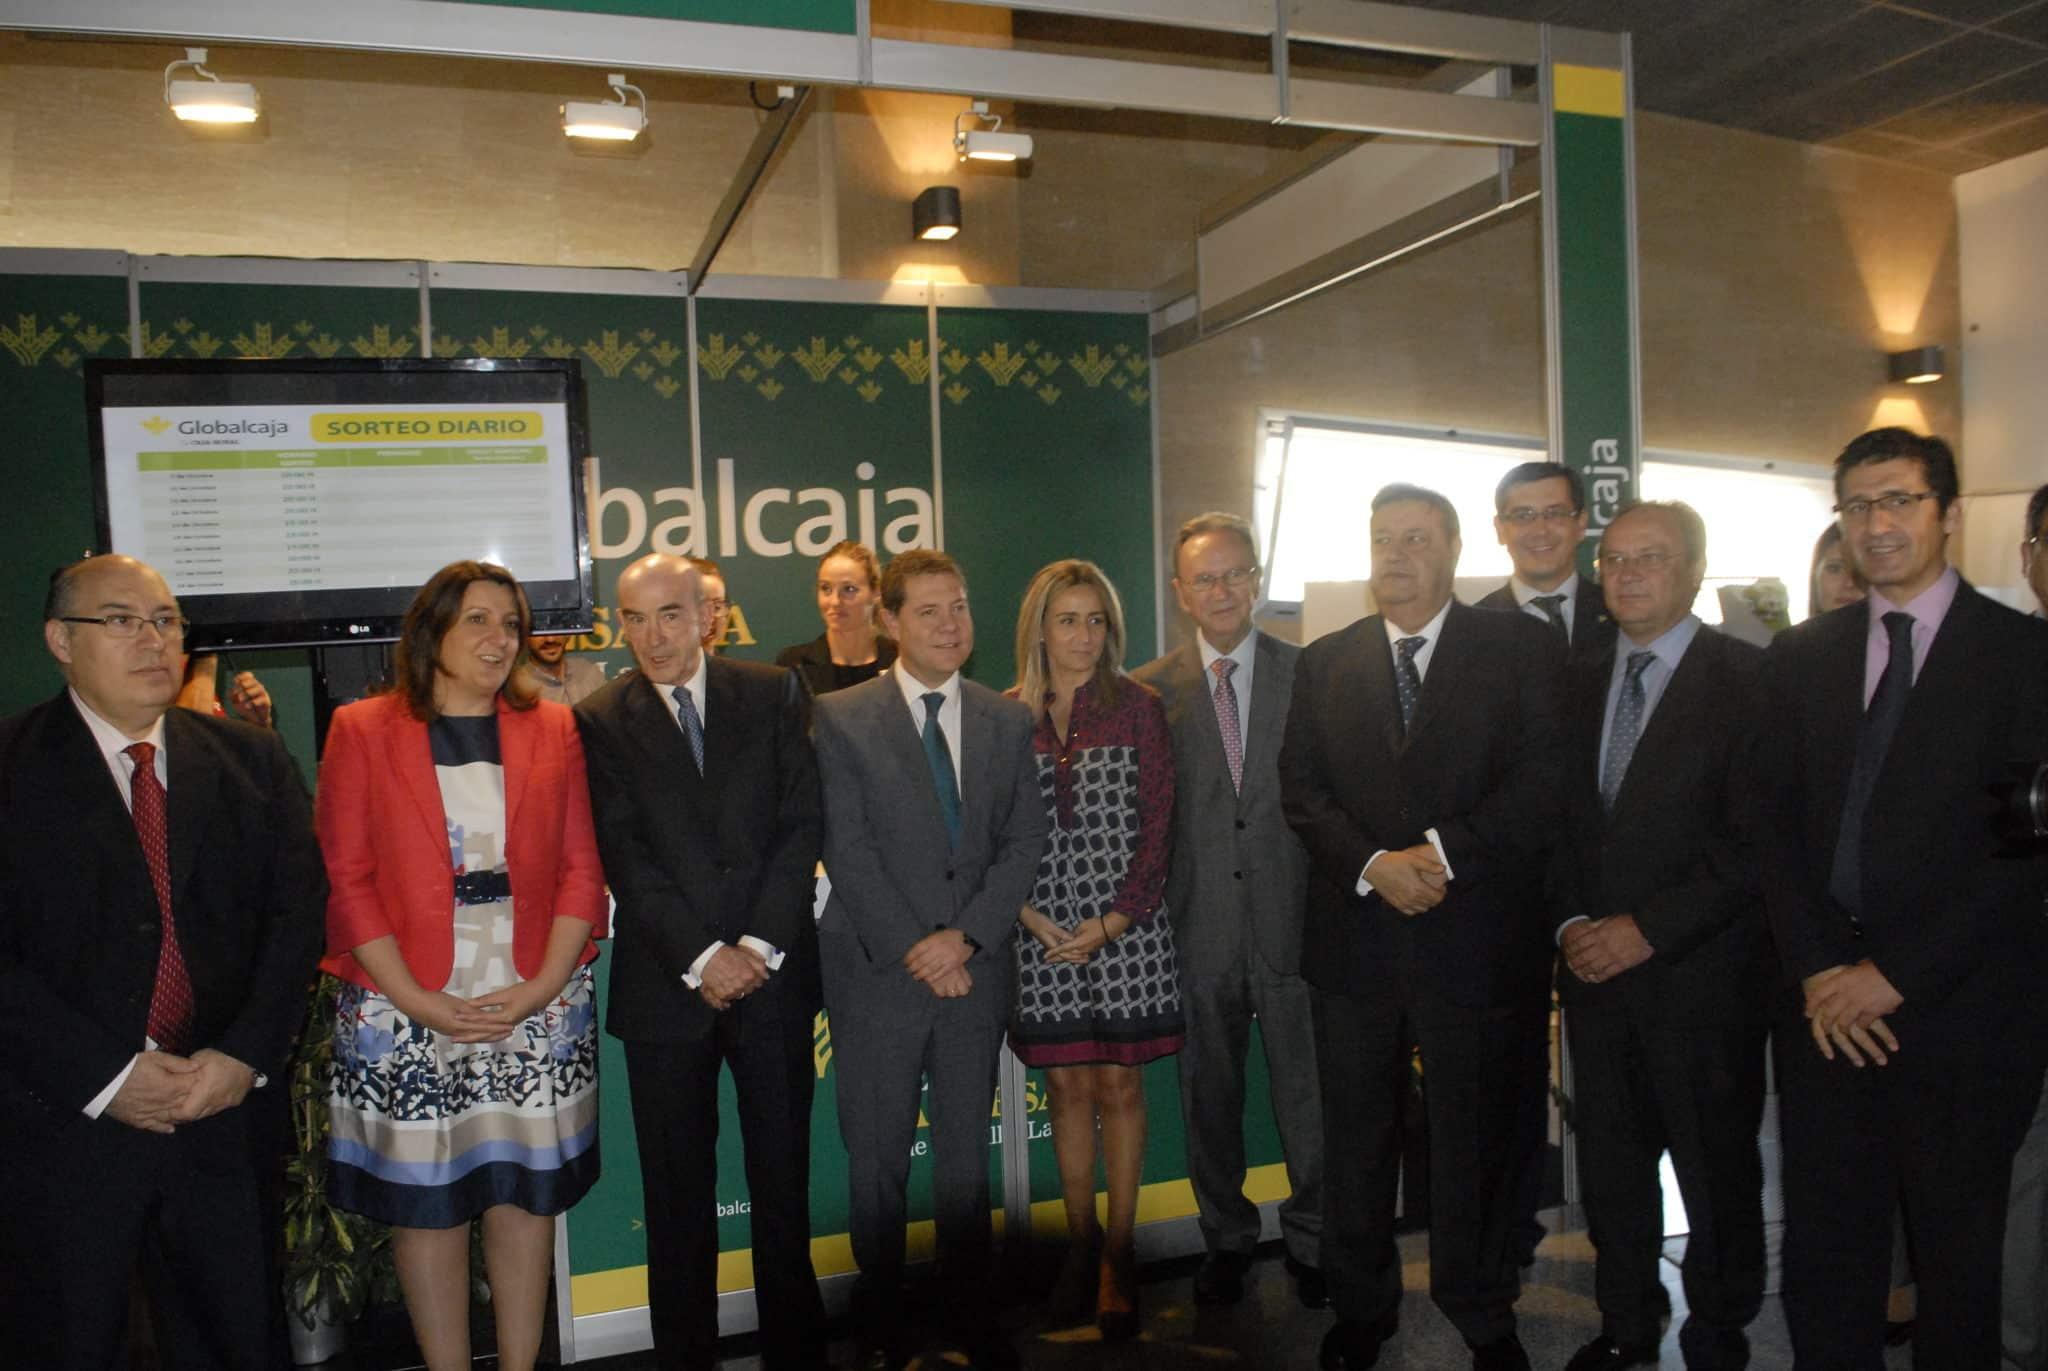 https://blog.globalcaja.es/wp-content/uploads/2015/10/globalcaja-farcama-oct-2015-008.jpg